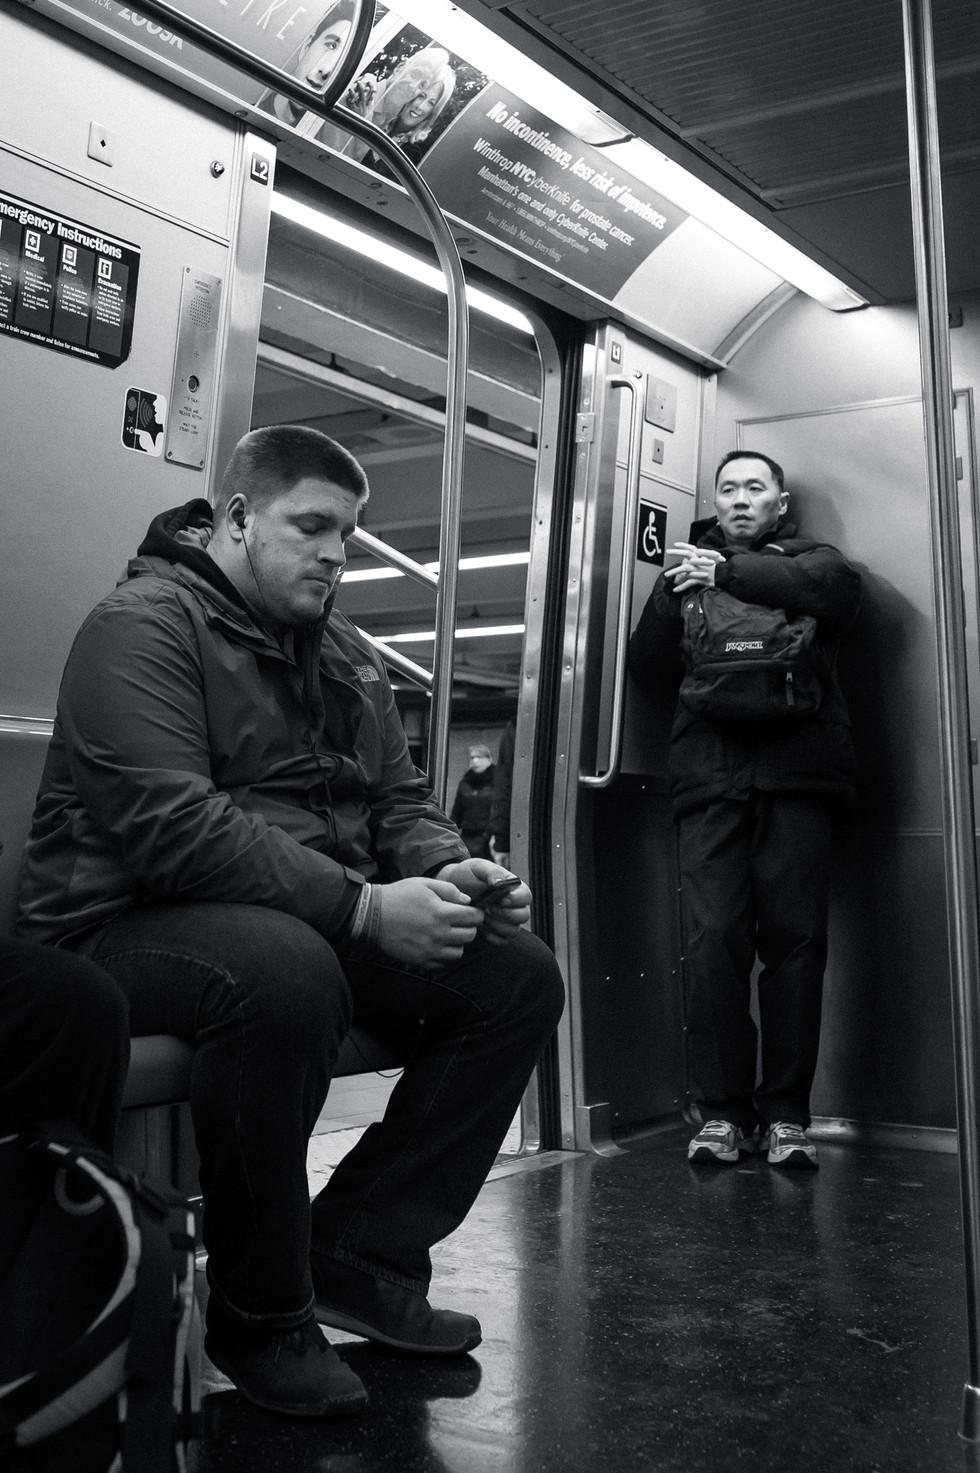 20141229-new york city-26544.jpg